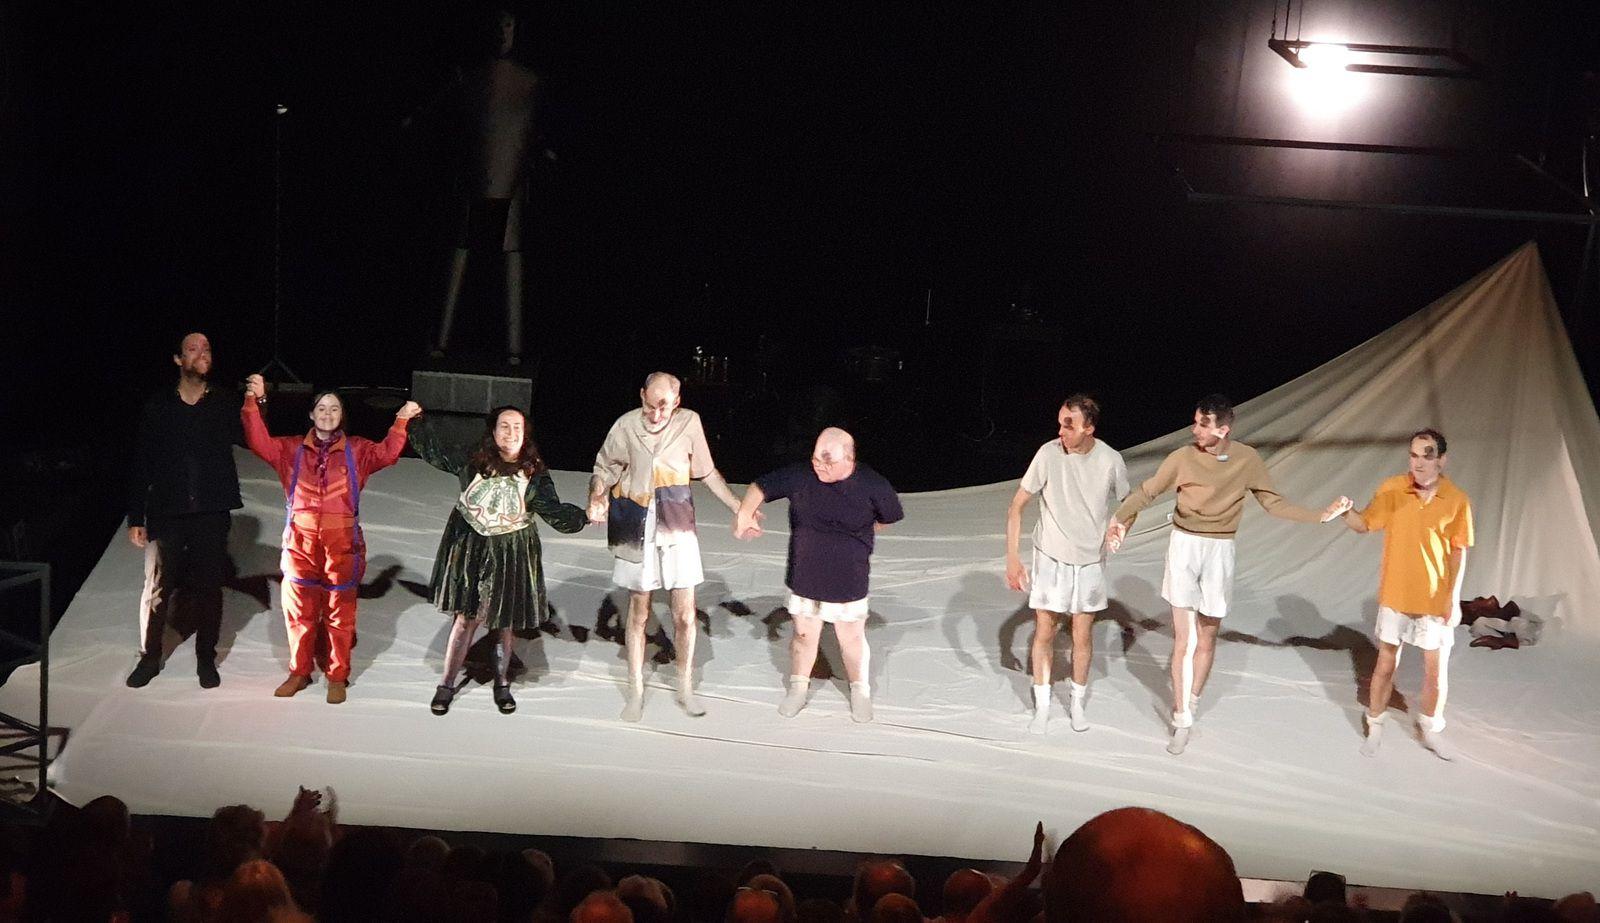 Gulliver, le dernier voyage, festival In d'Avignon - troupe Catalyse